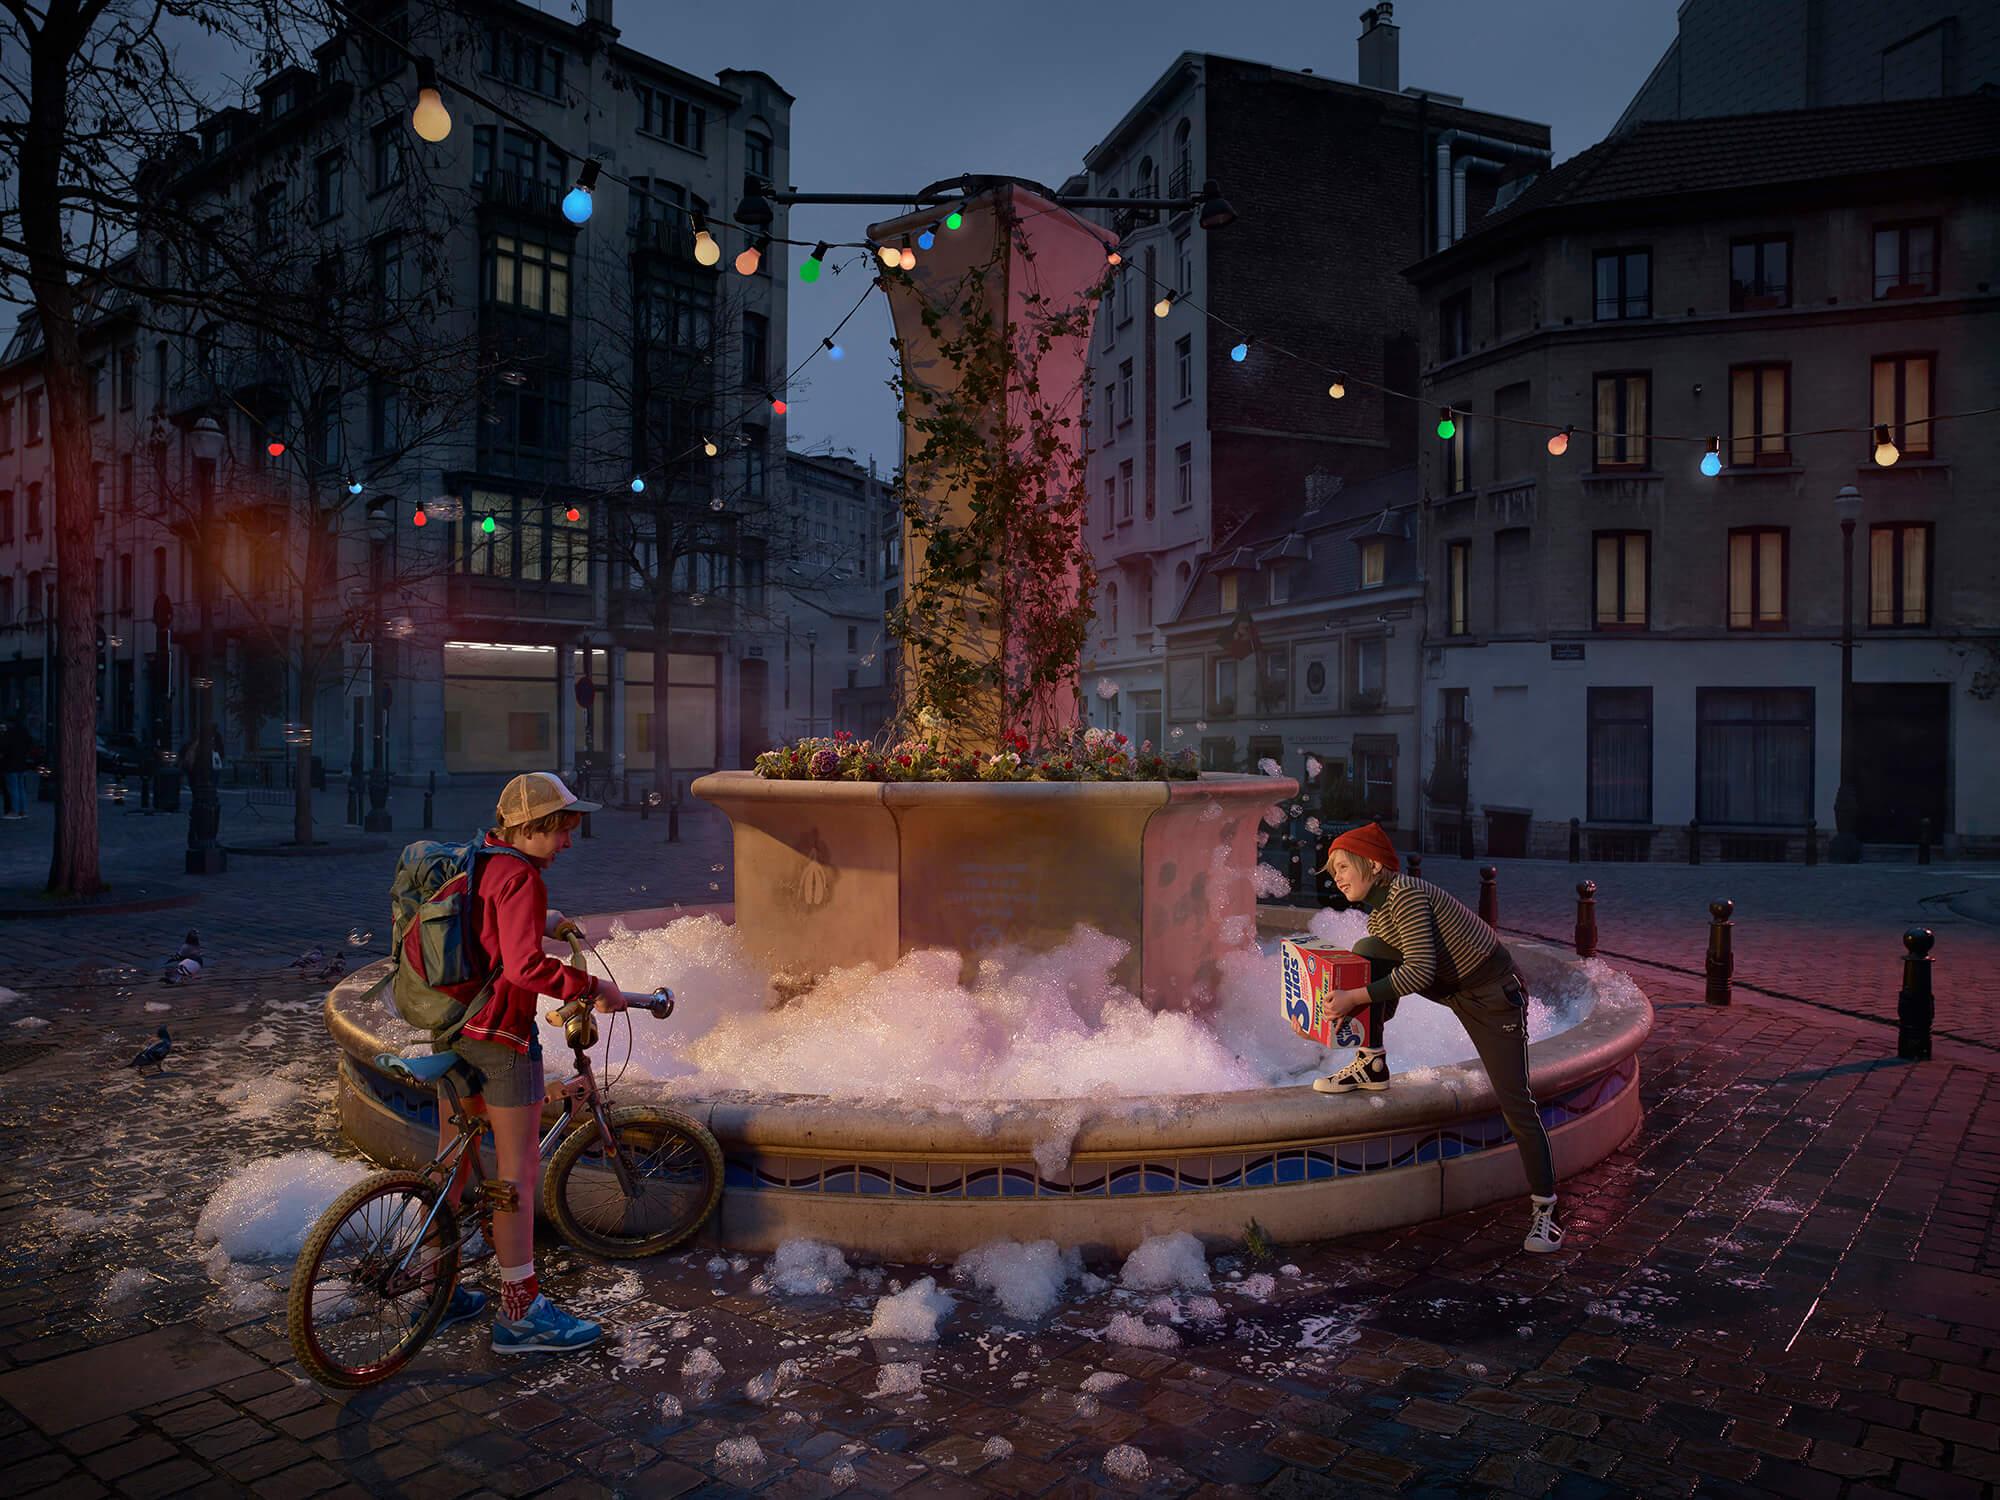 Landor + Fitch by Geert de Taeye